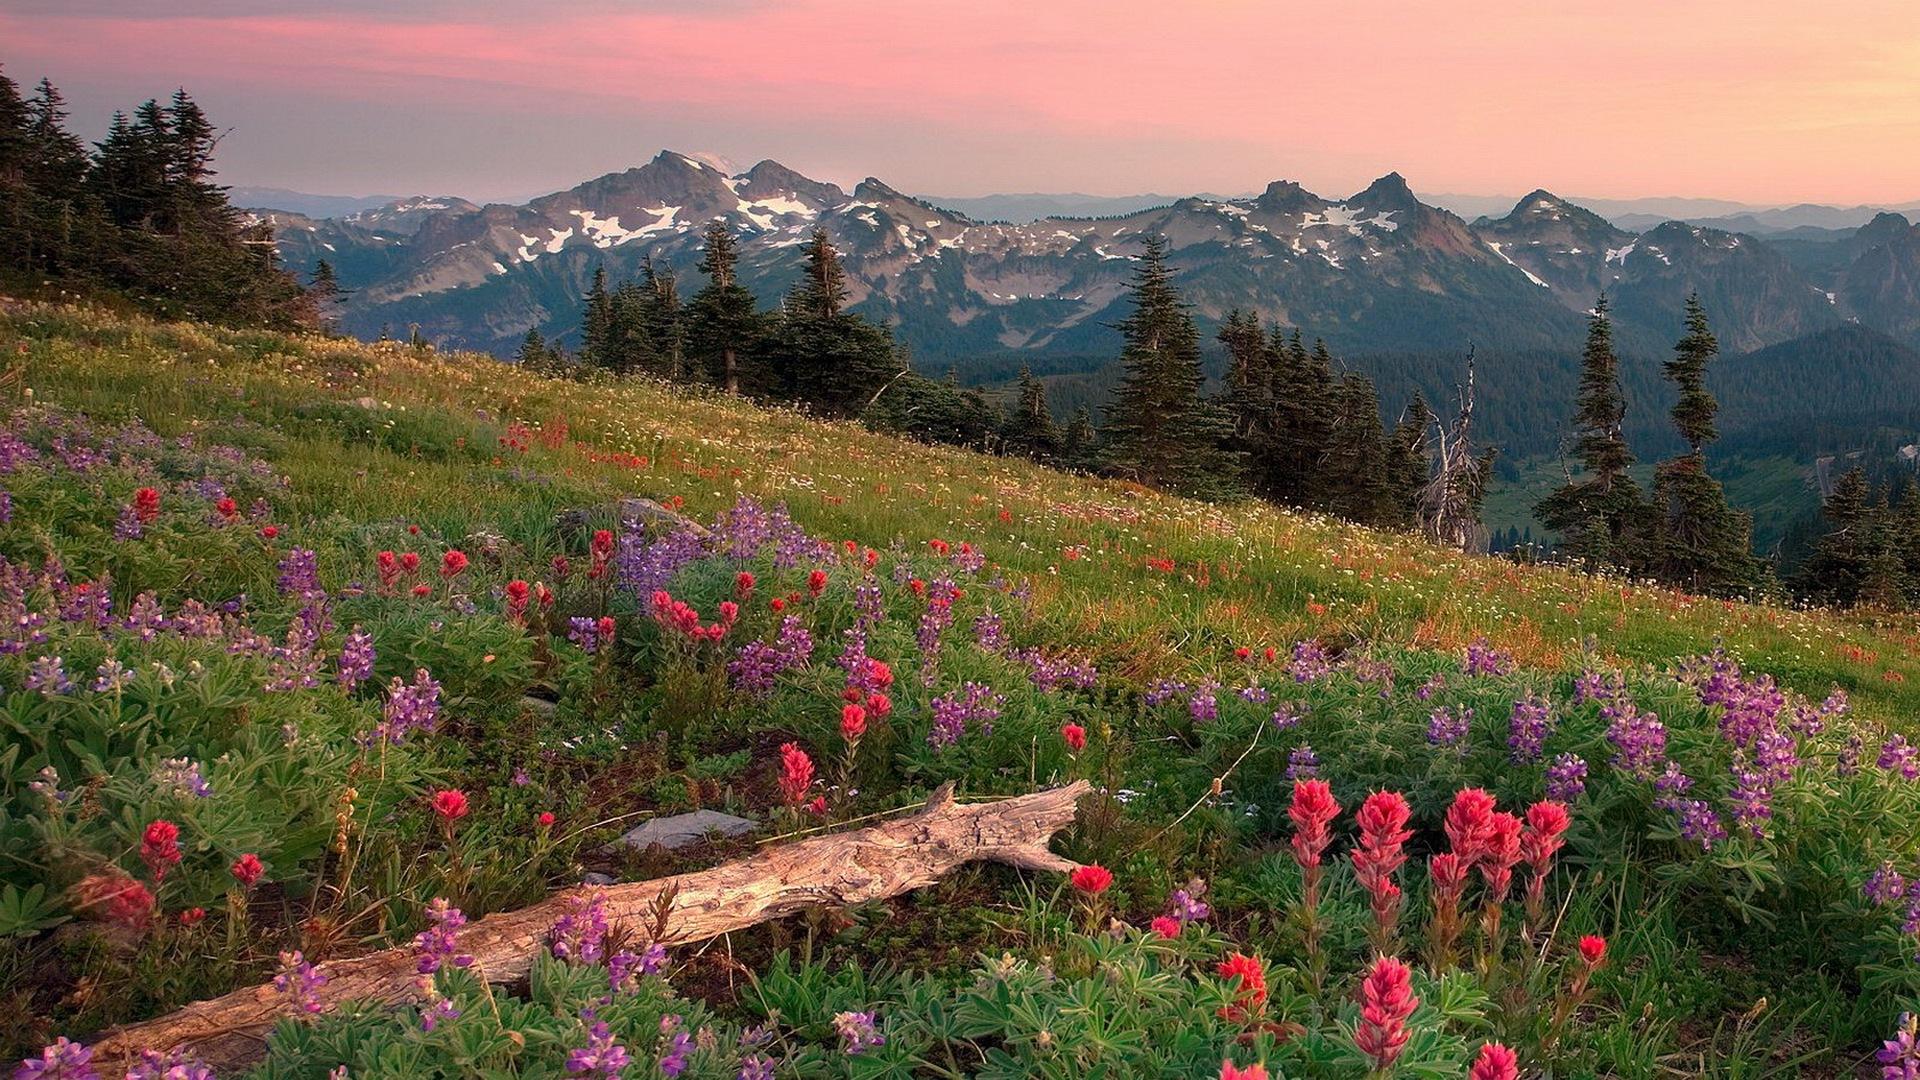 summer landscape image wallpaper - photo #29